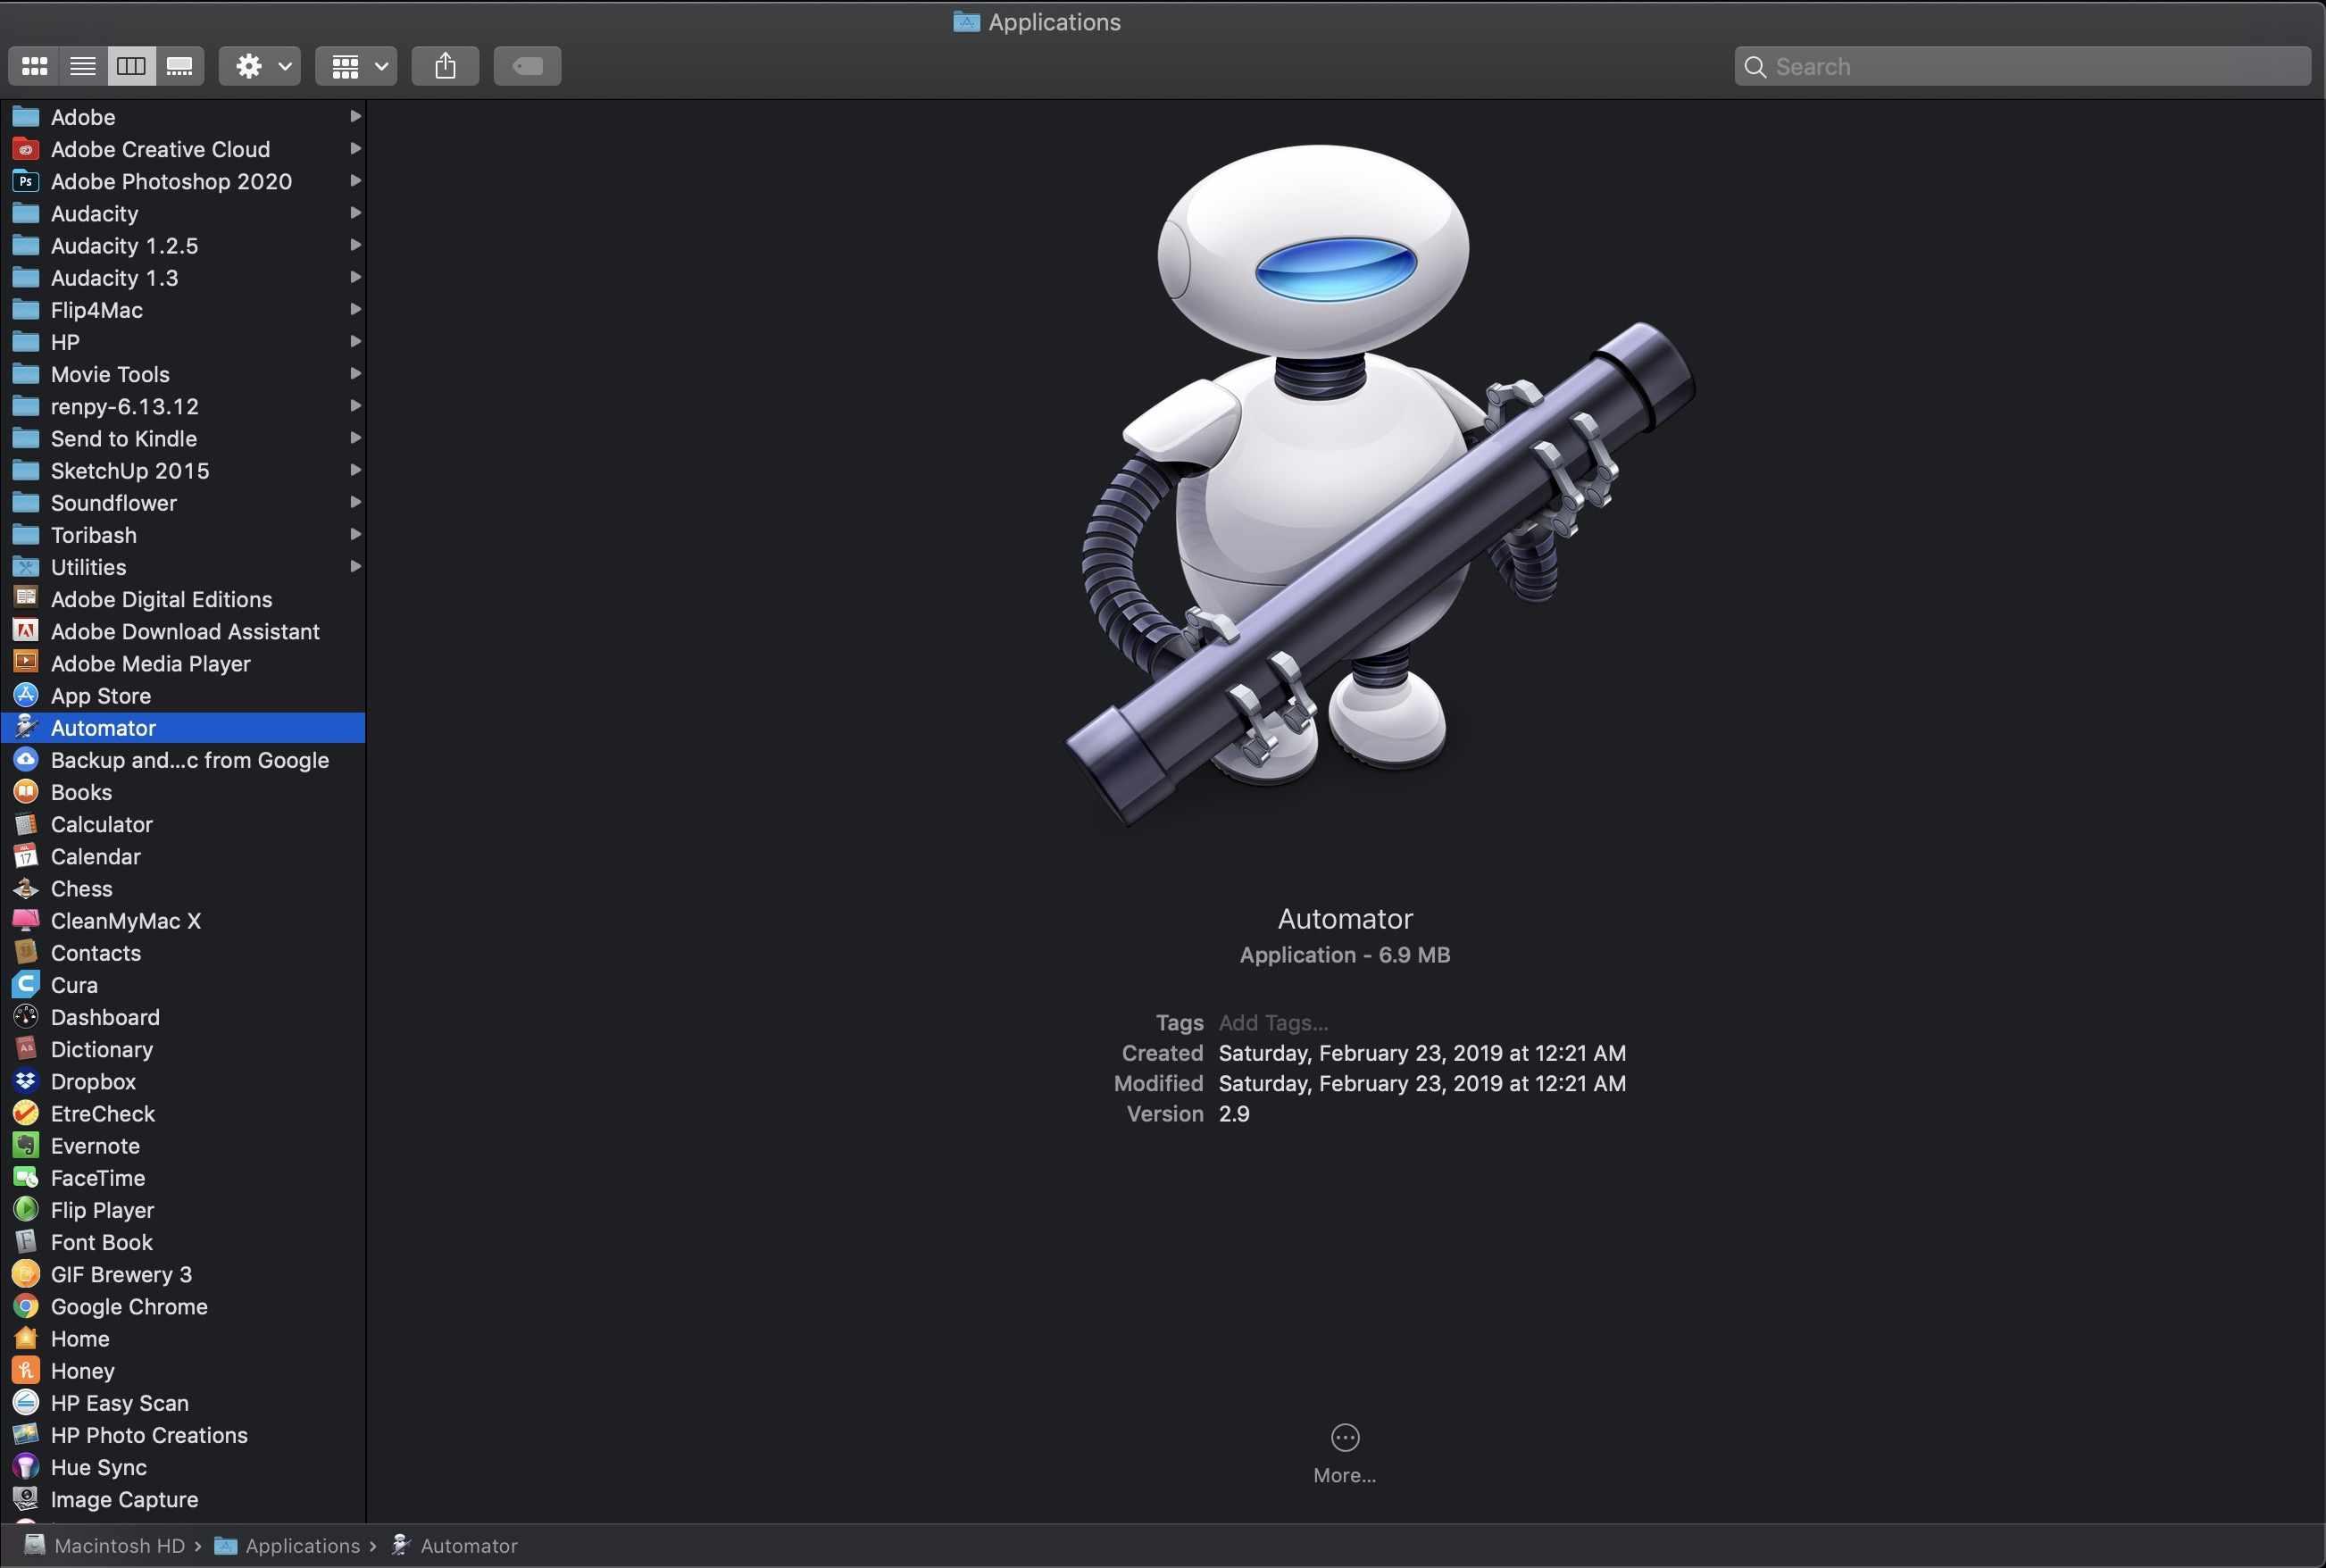 Automator in Finder